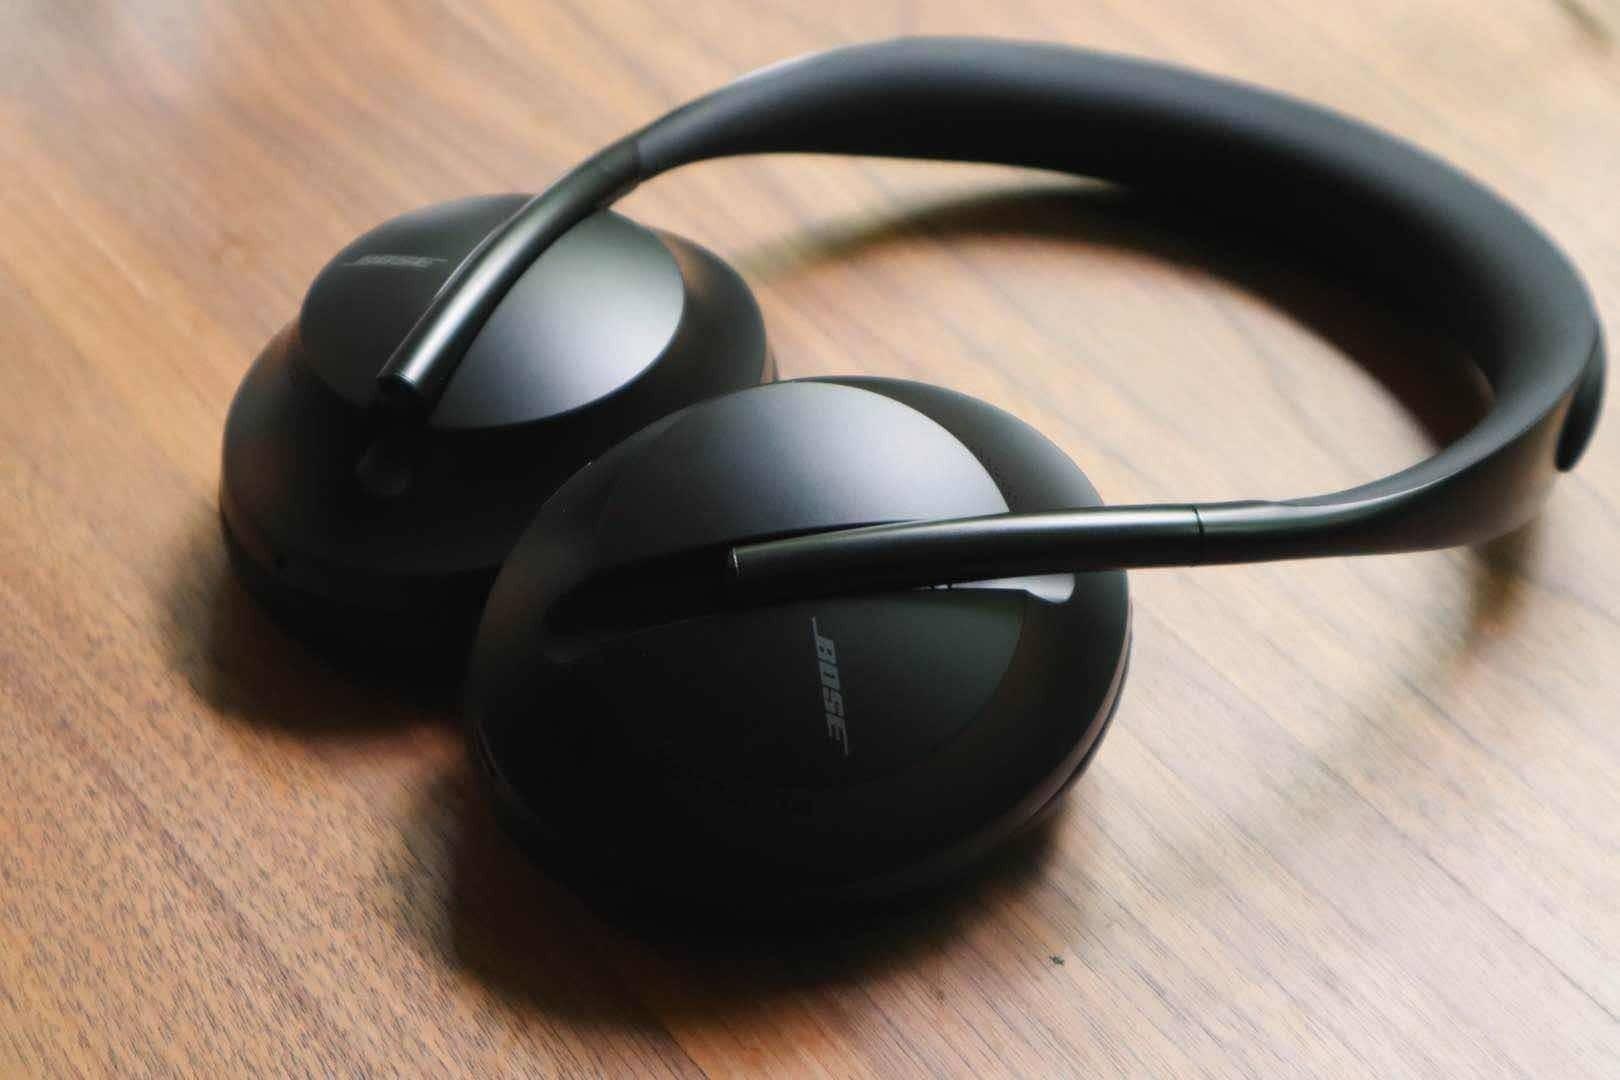 Bose 700 降噪耳机现场体验:外观更时尚,通话降噪效果明显 v118.com